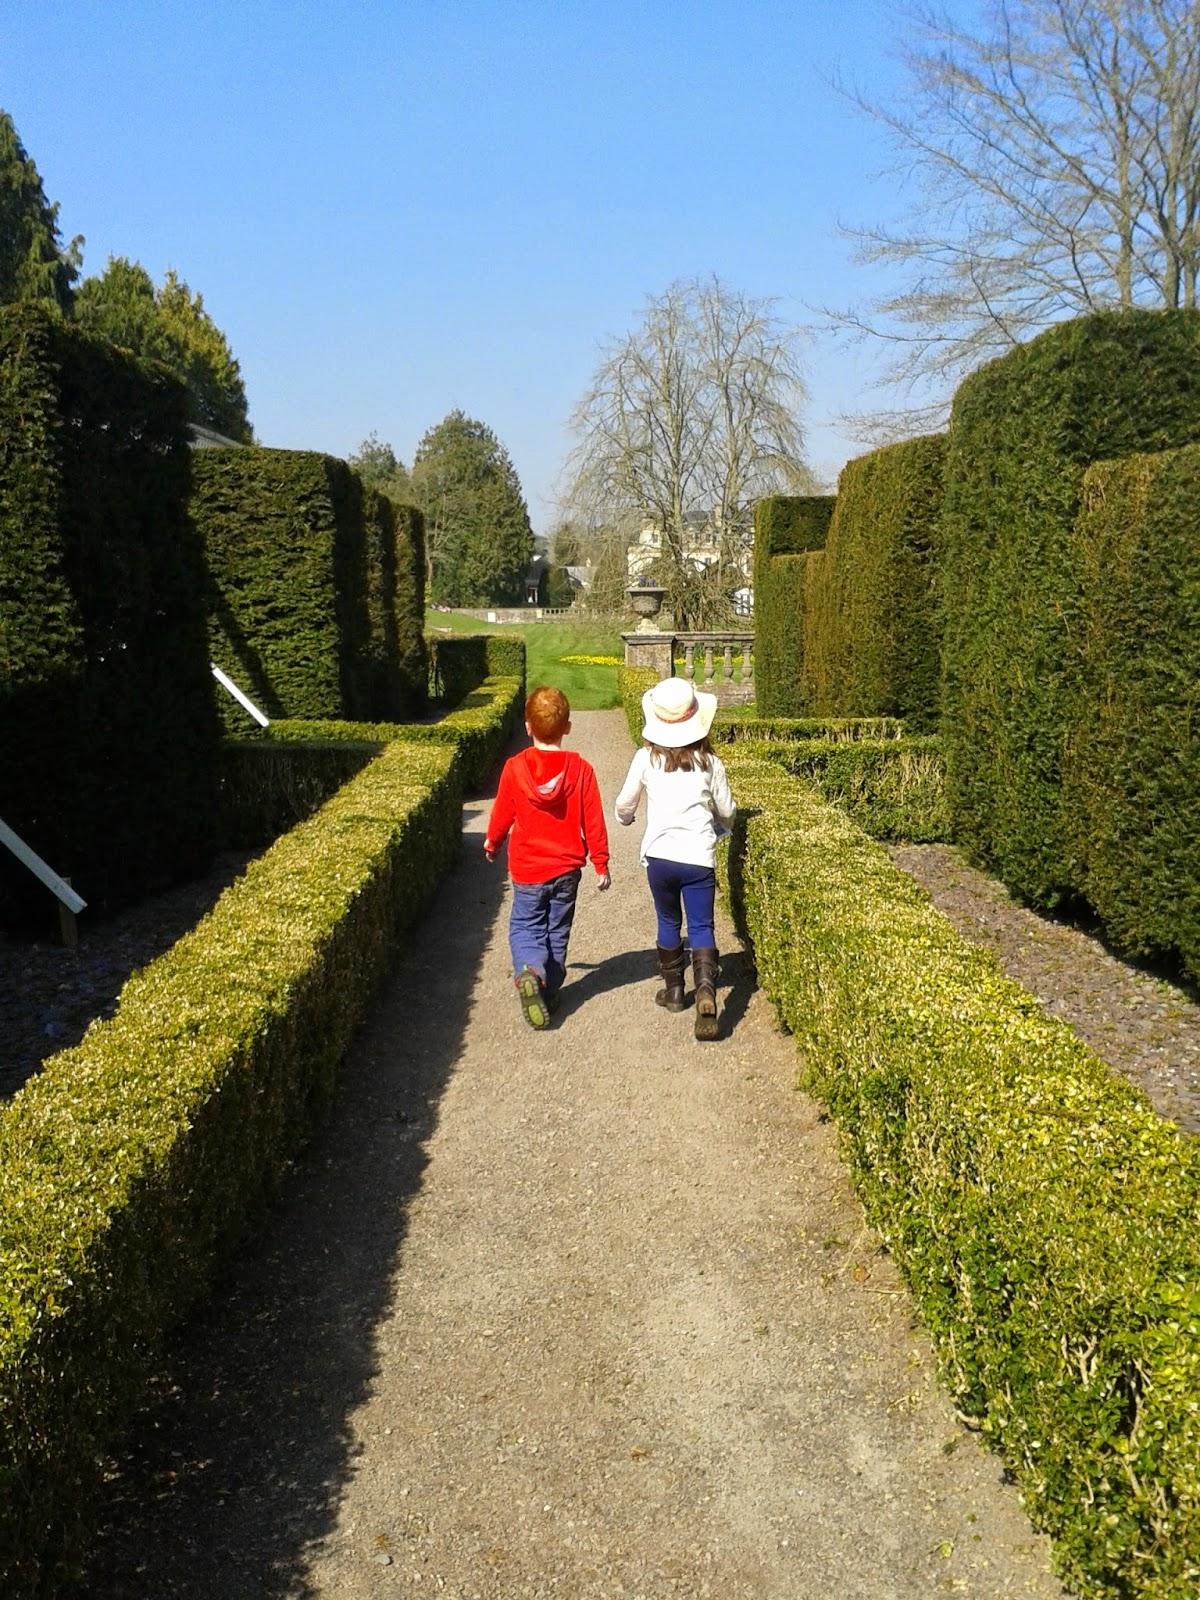 Caitlin & Ieuan at Dyffryn Gardens, Vale of Glamorgan